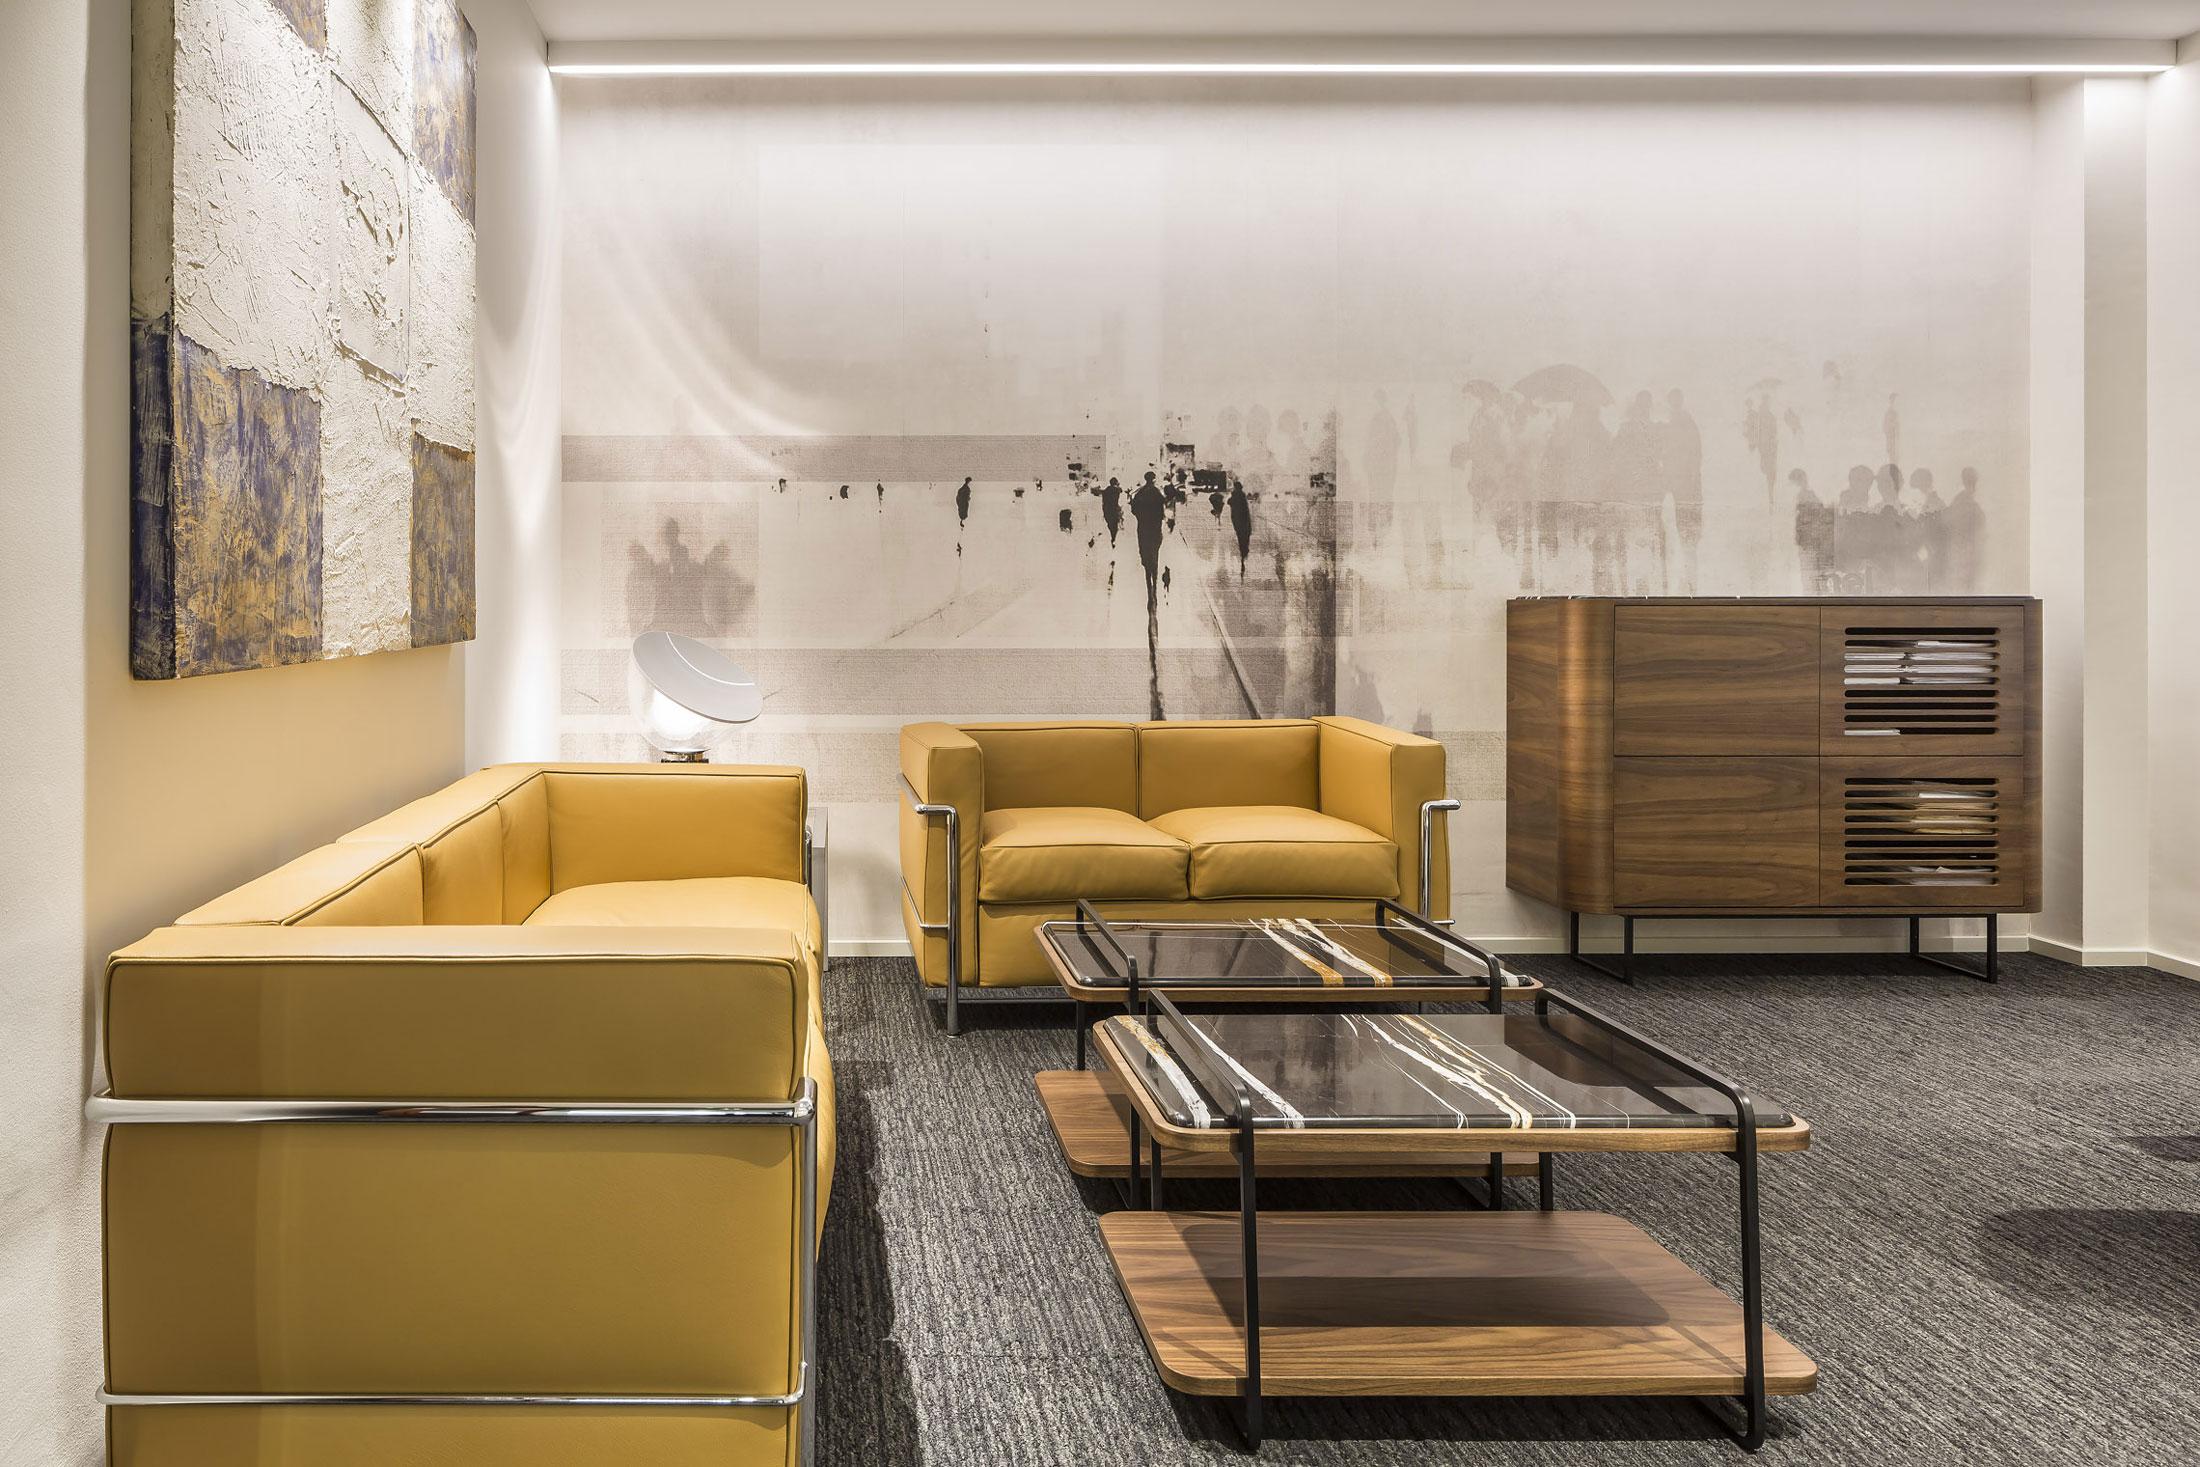 Adara Light by Momocca interiorismo contract